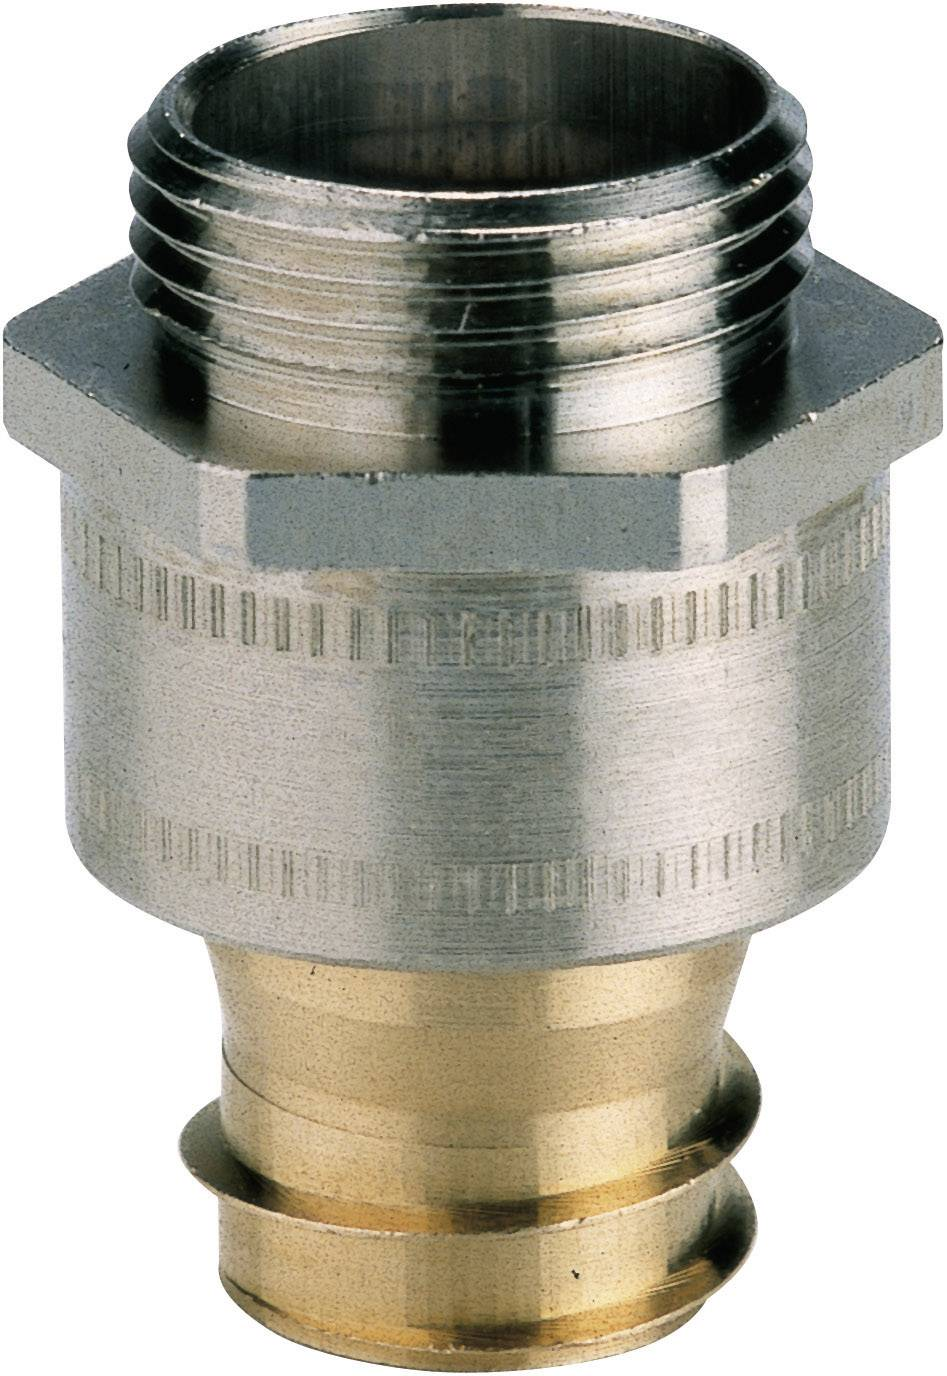 Hadicová spojka rovná LAPP SILVYN® LI-M 10x1,5 SGY 61802369, M10, stříbrná, 1 ks